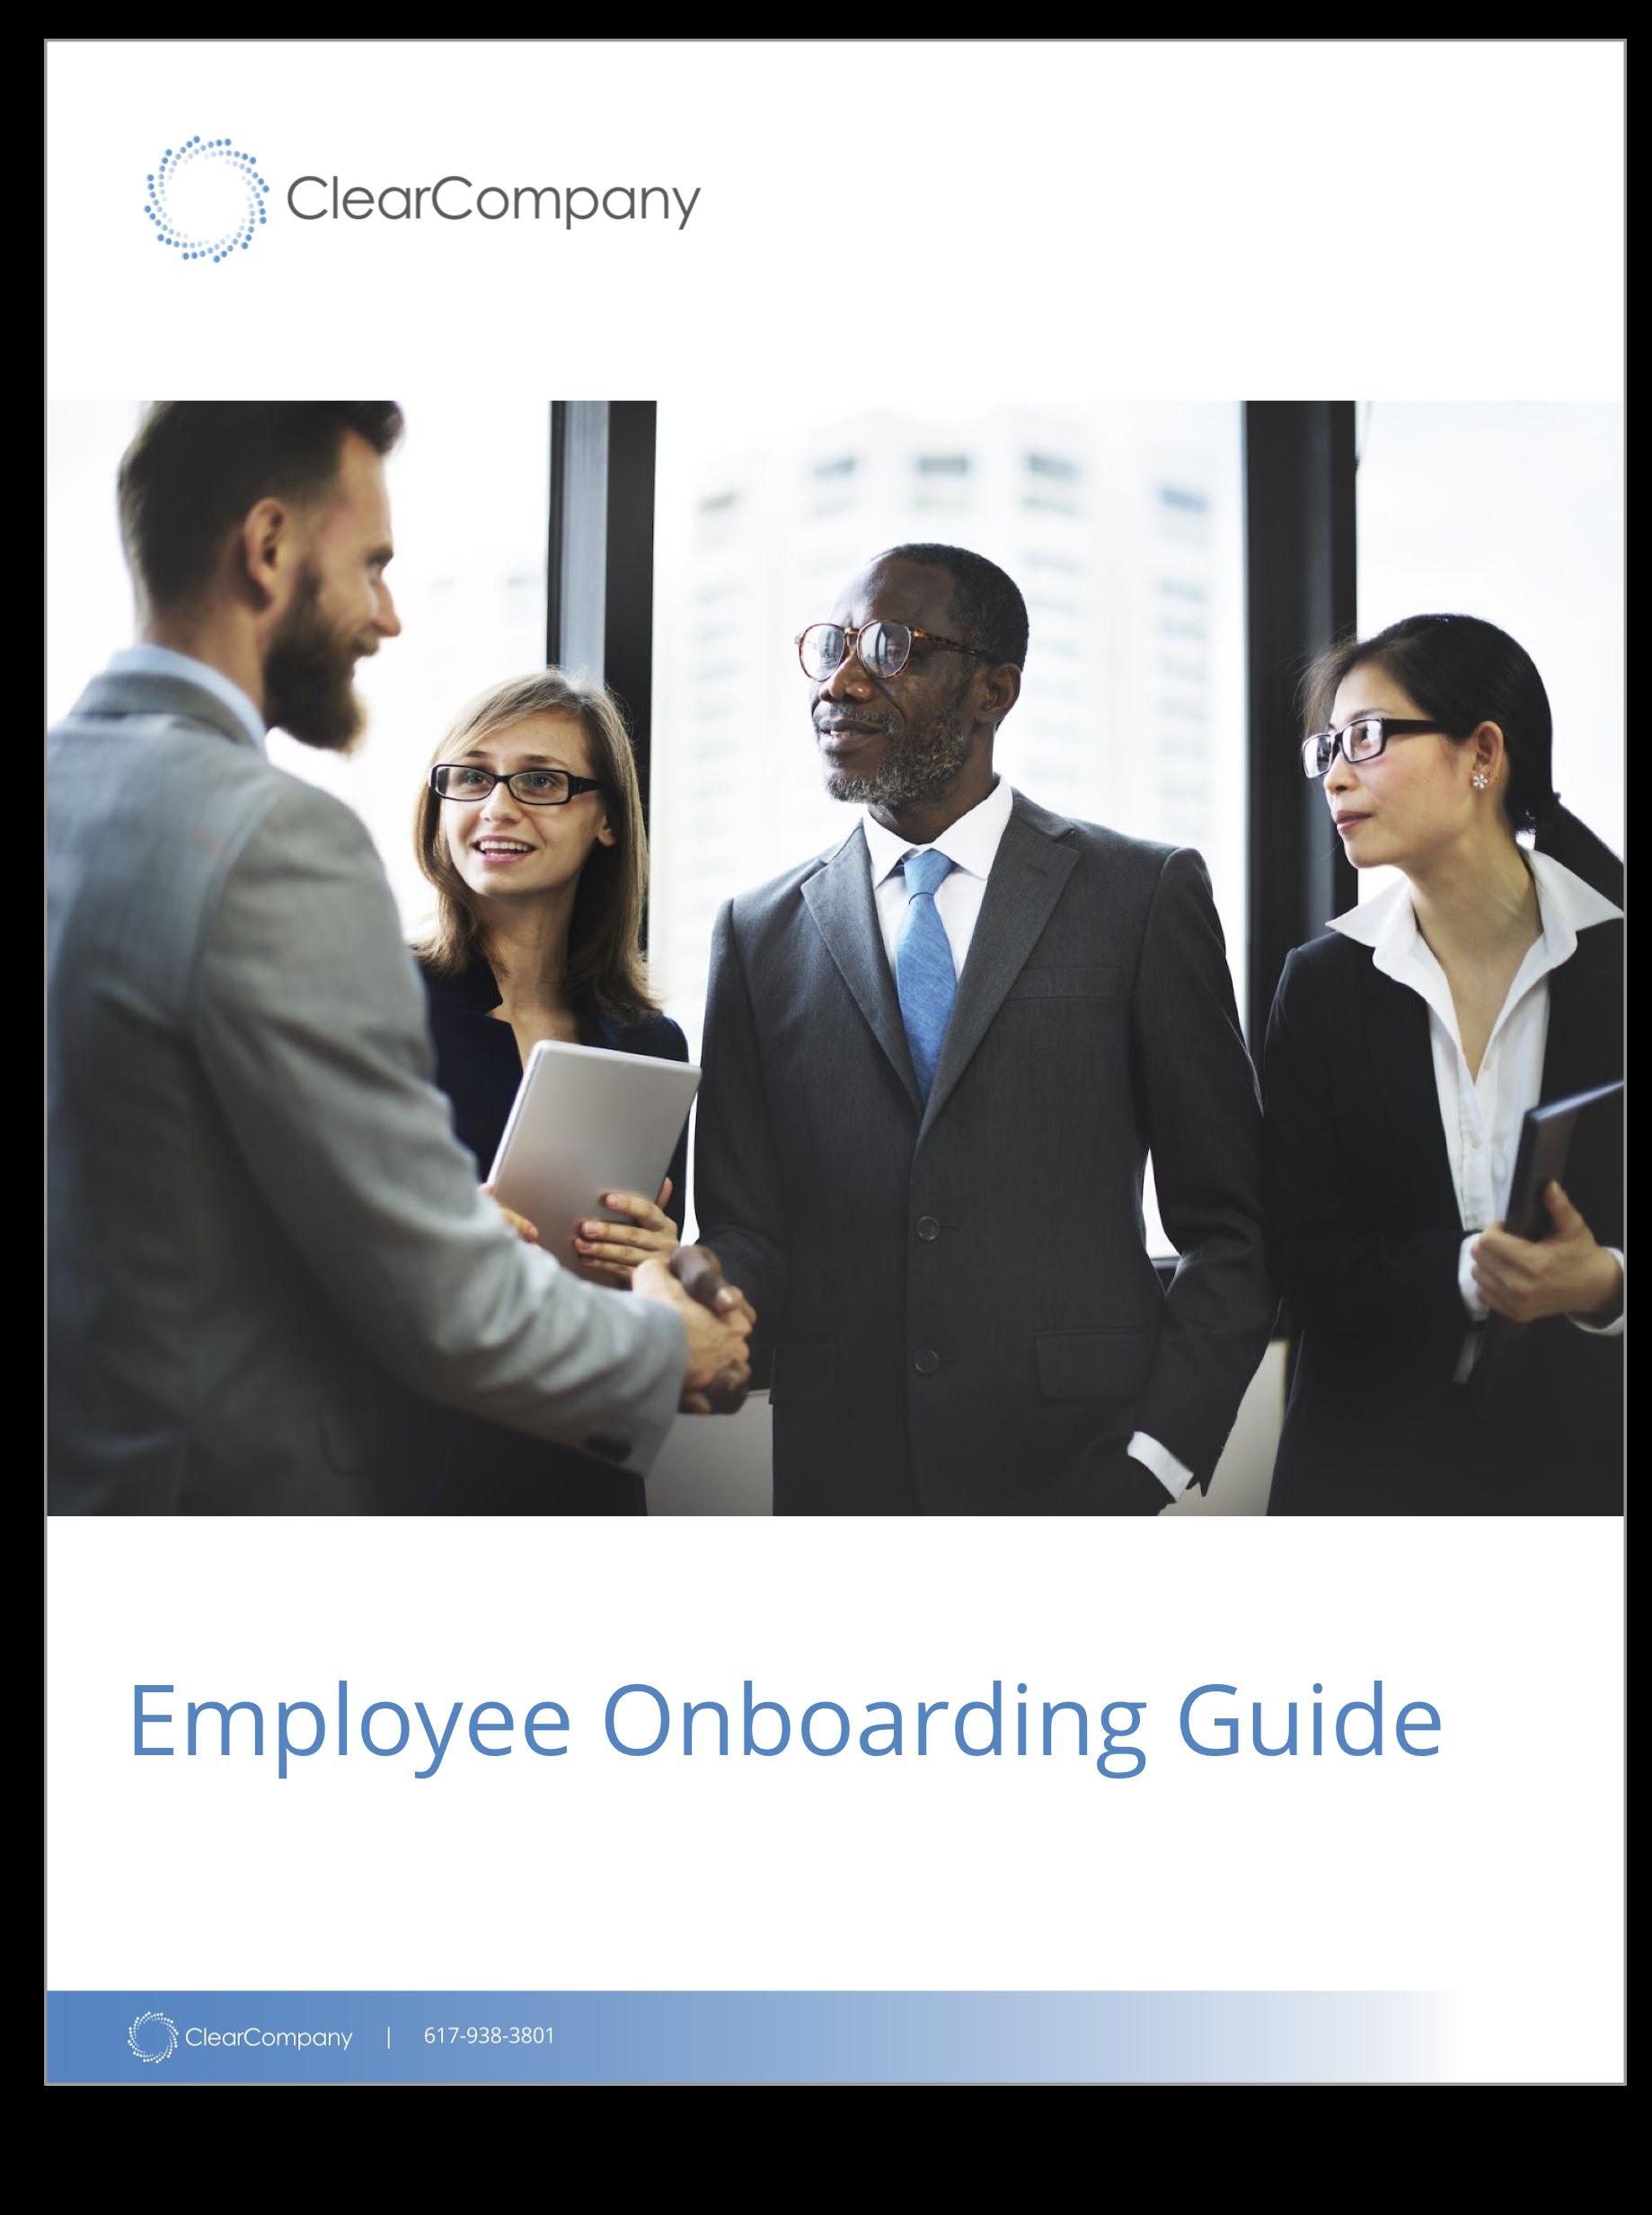 Employee-Onboarding-Guide-Mockup.png